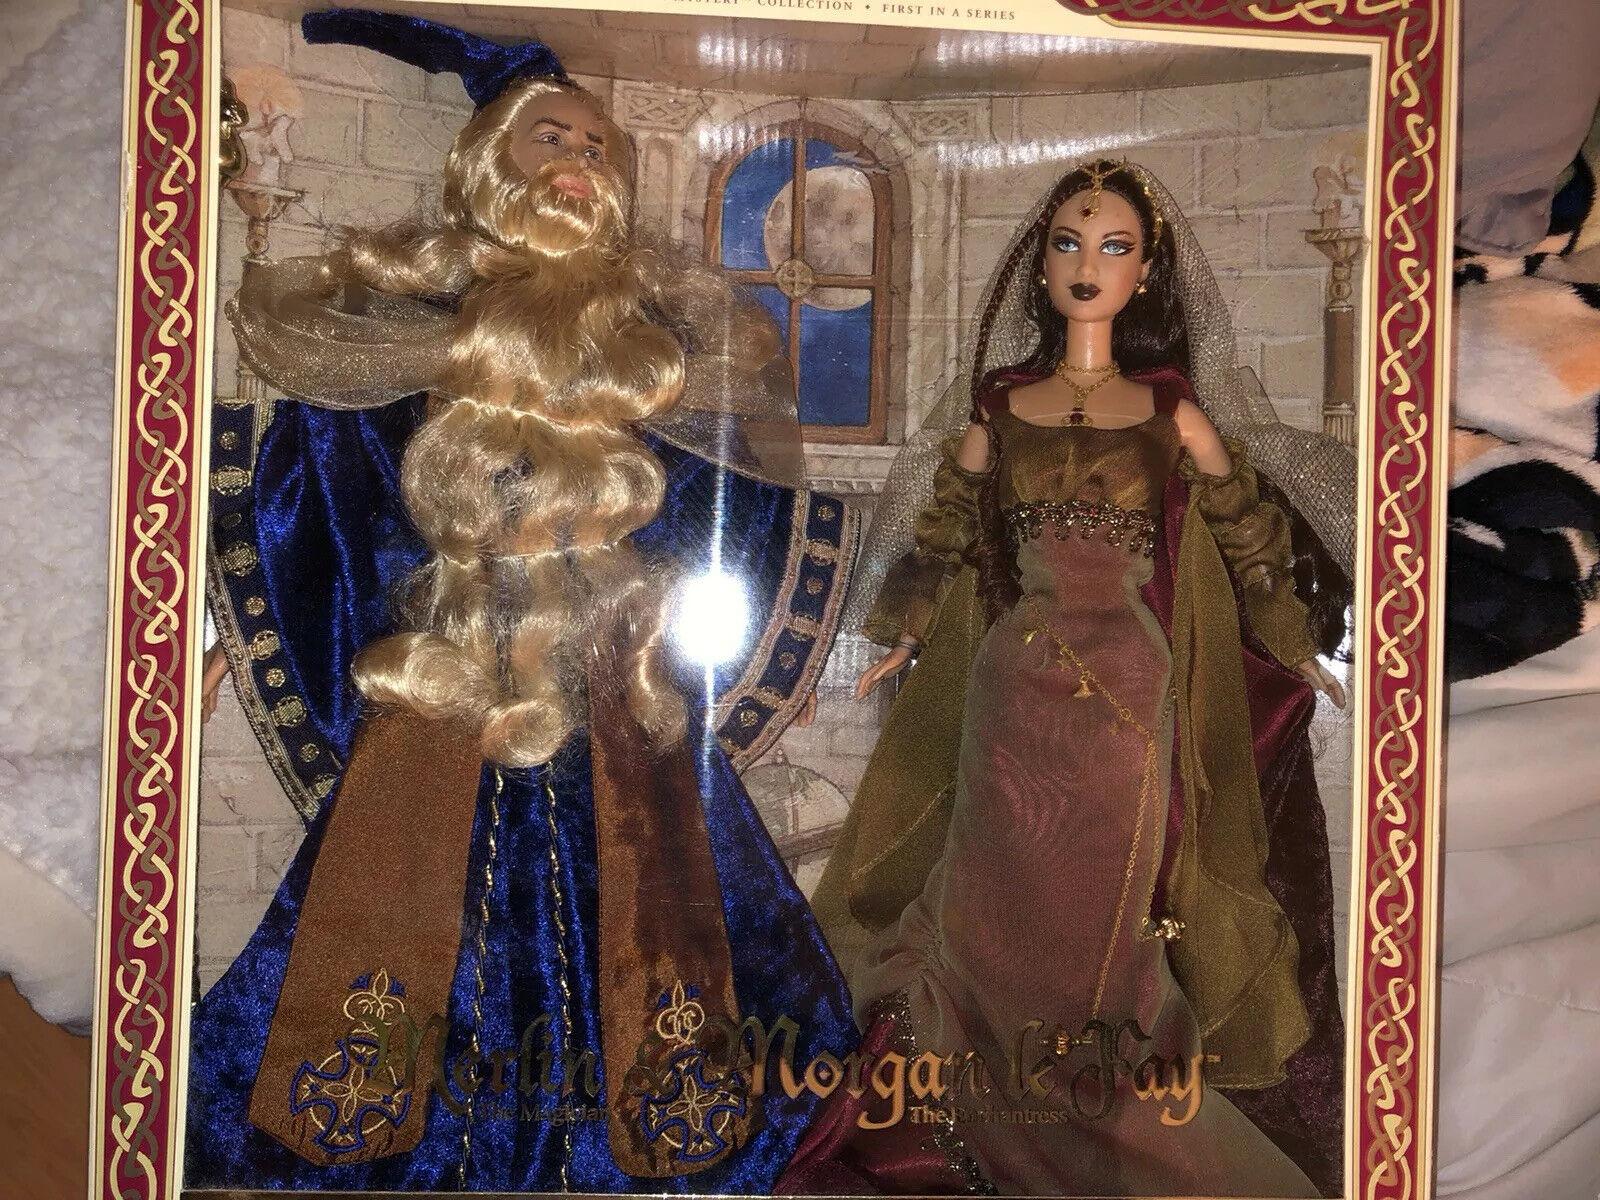 MERLIN & MORGAN LE FAY Barbie & Ken Doll Gift Set 27287